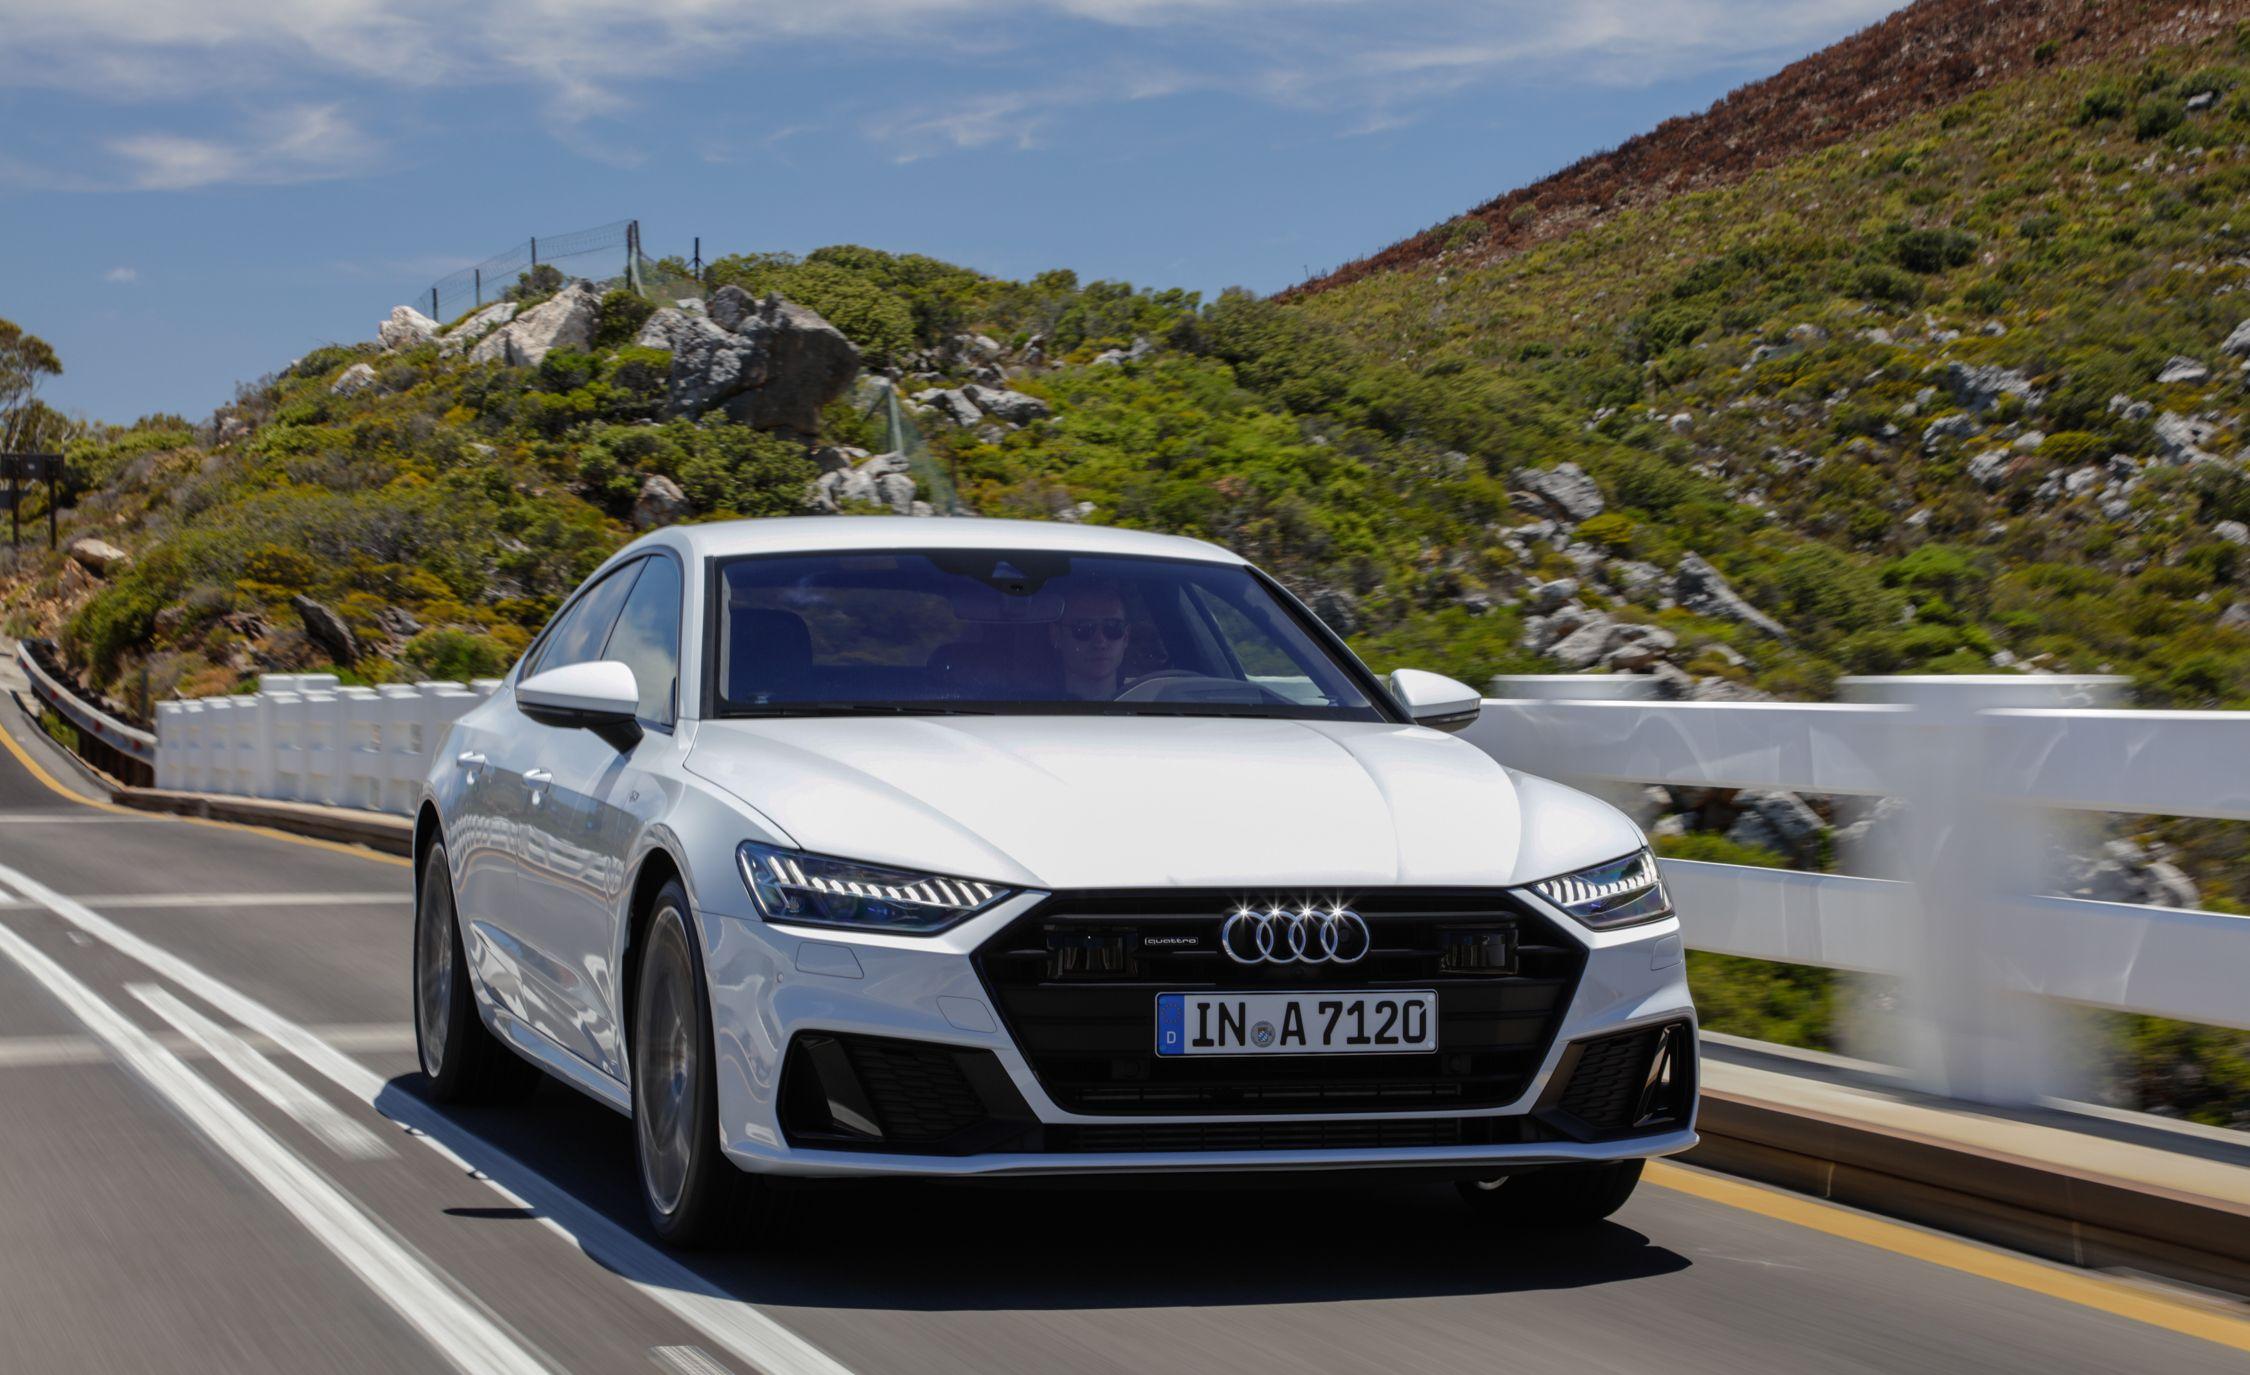 2019-Audi-A7-Sportback-184-1.jpg